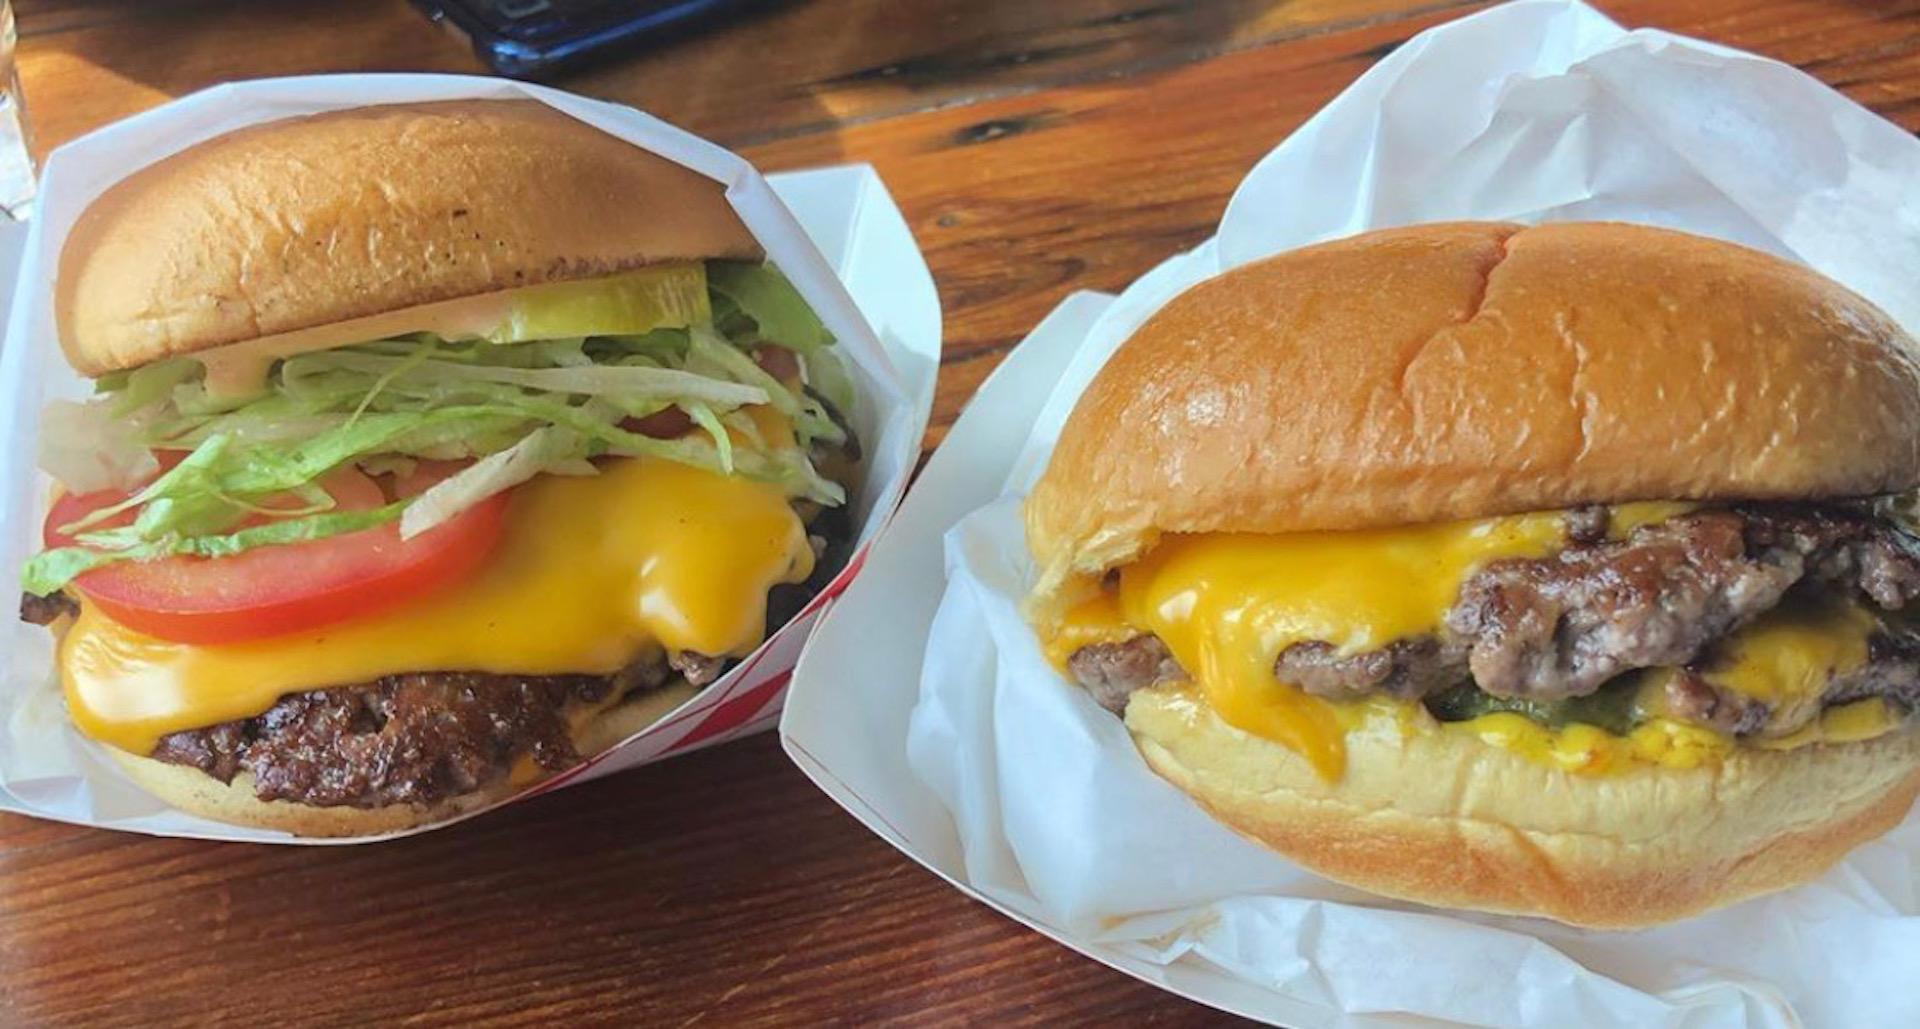 A drive thru burger and an OG burger from Oakland's Lovely's.